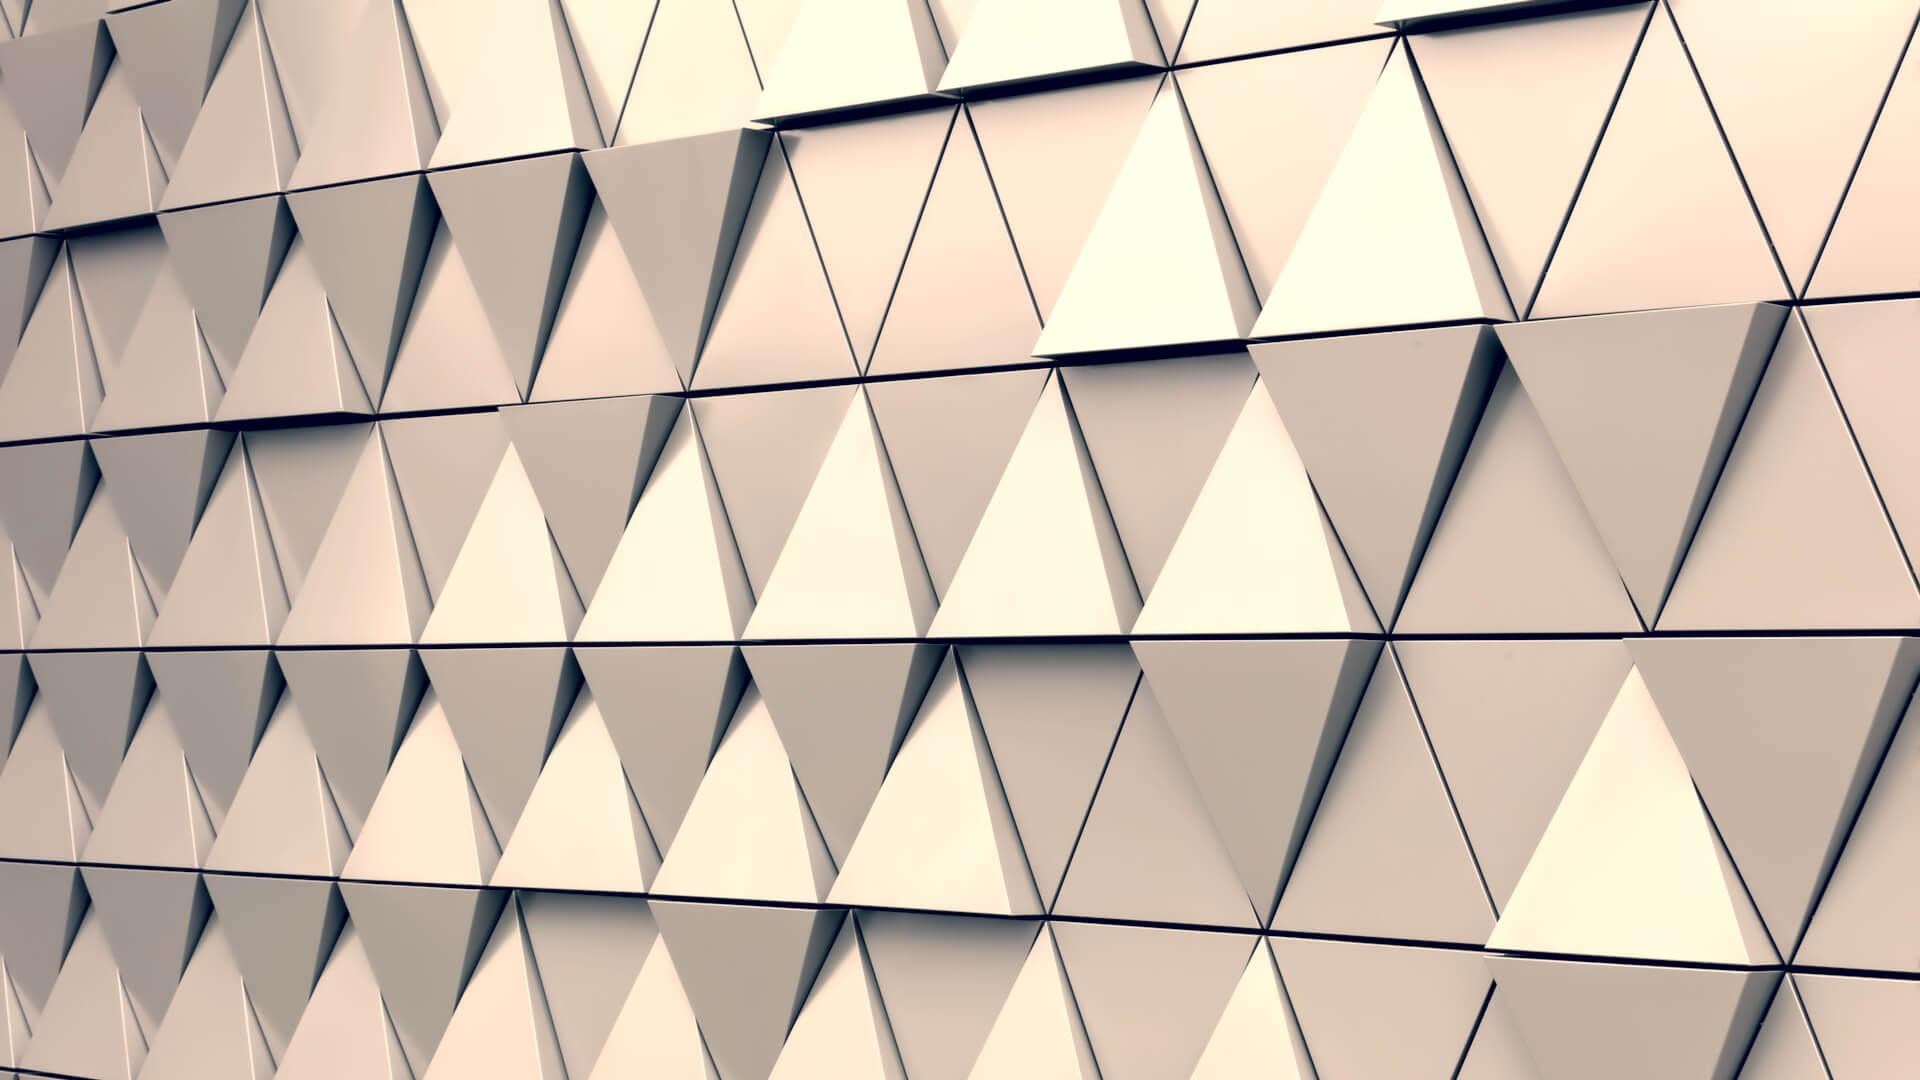 Eco design materials: bandoxalPRO answers low-carbon footprint needs